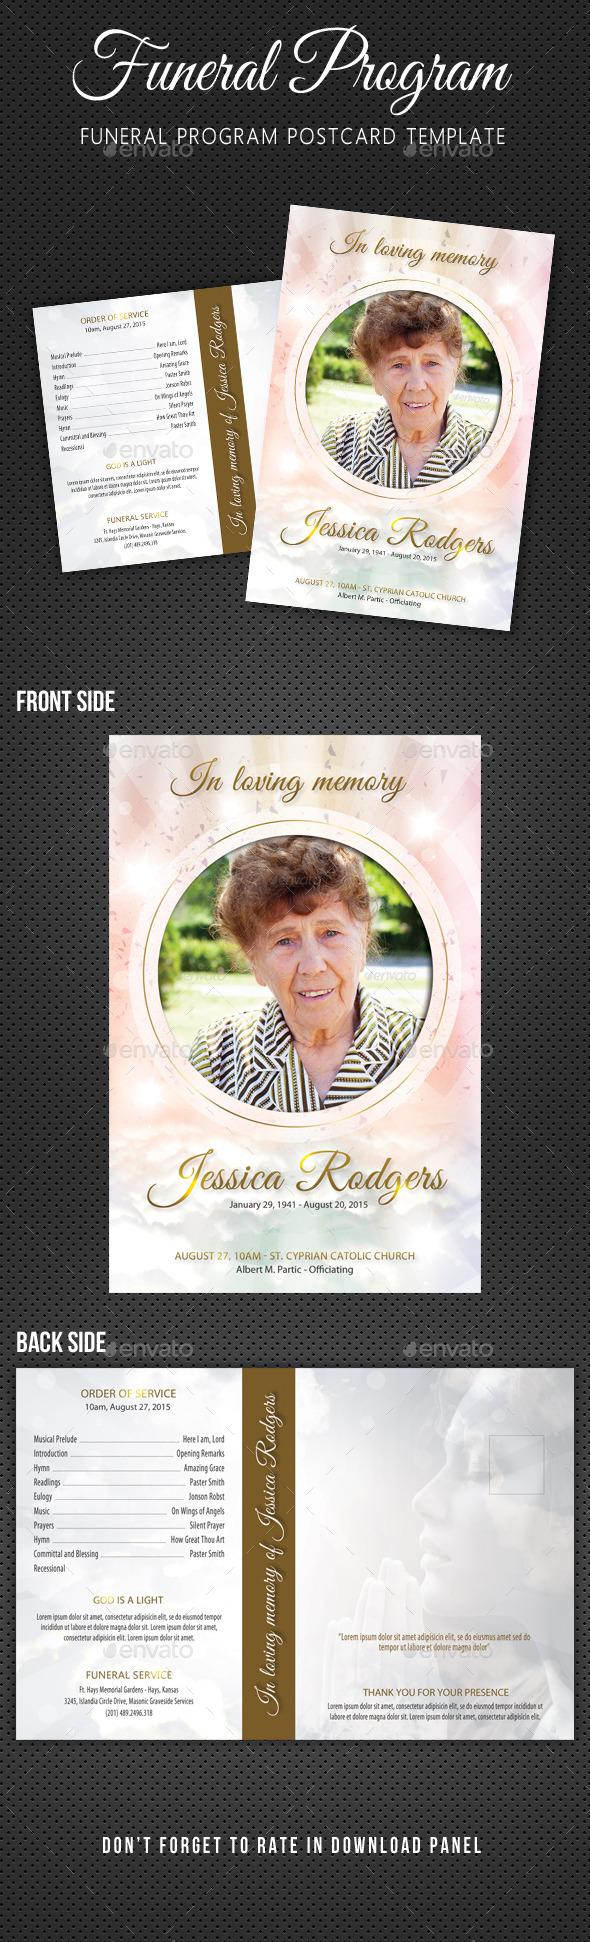 Funeral Program Postcard Template V03 - Cards & Invites Print Templates